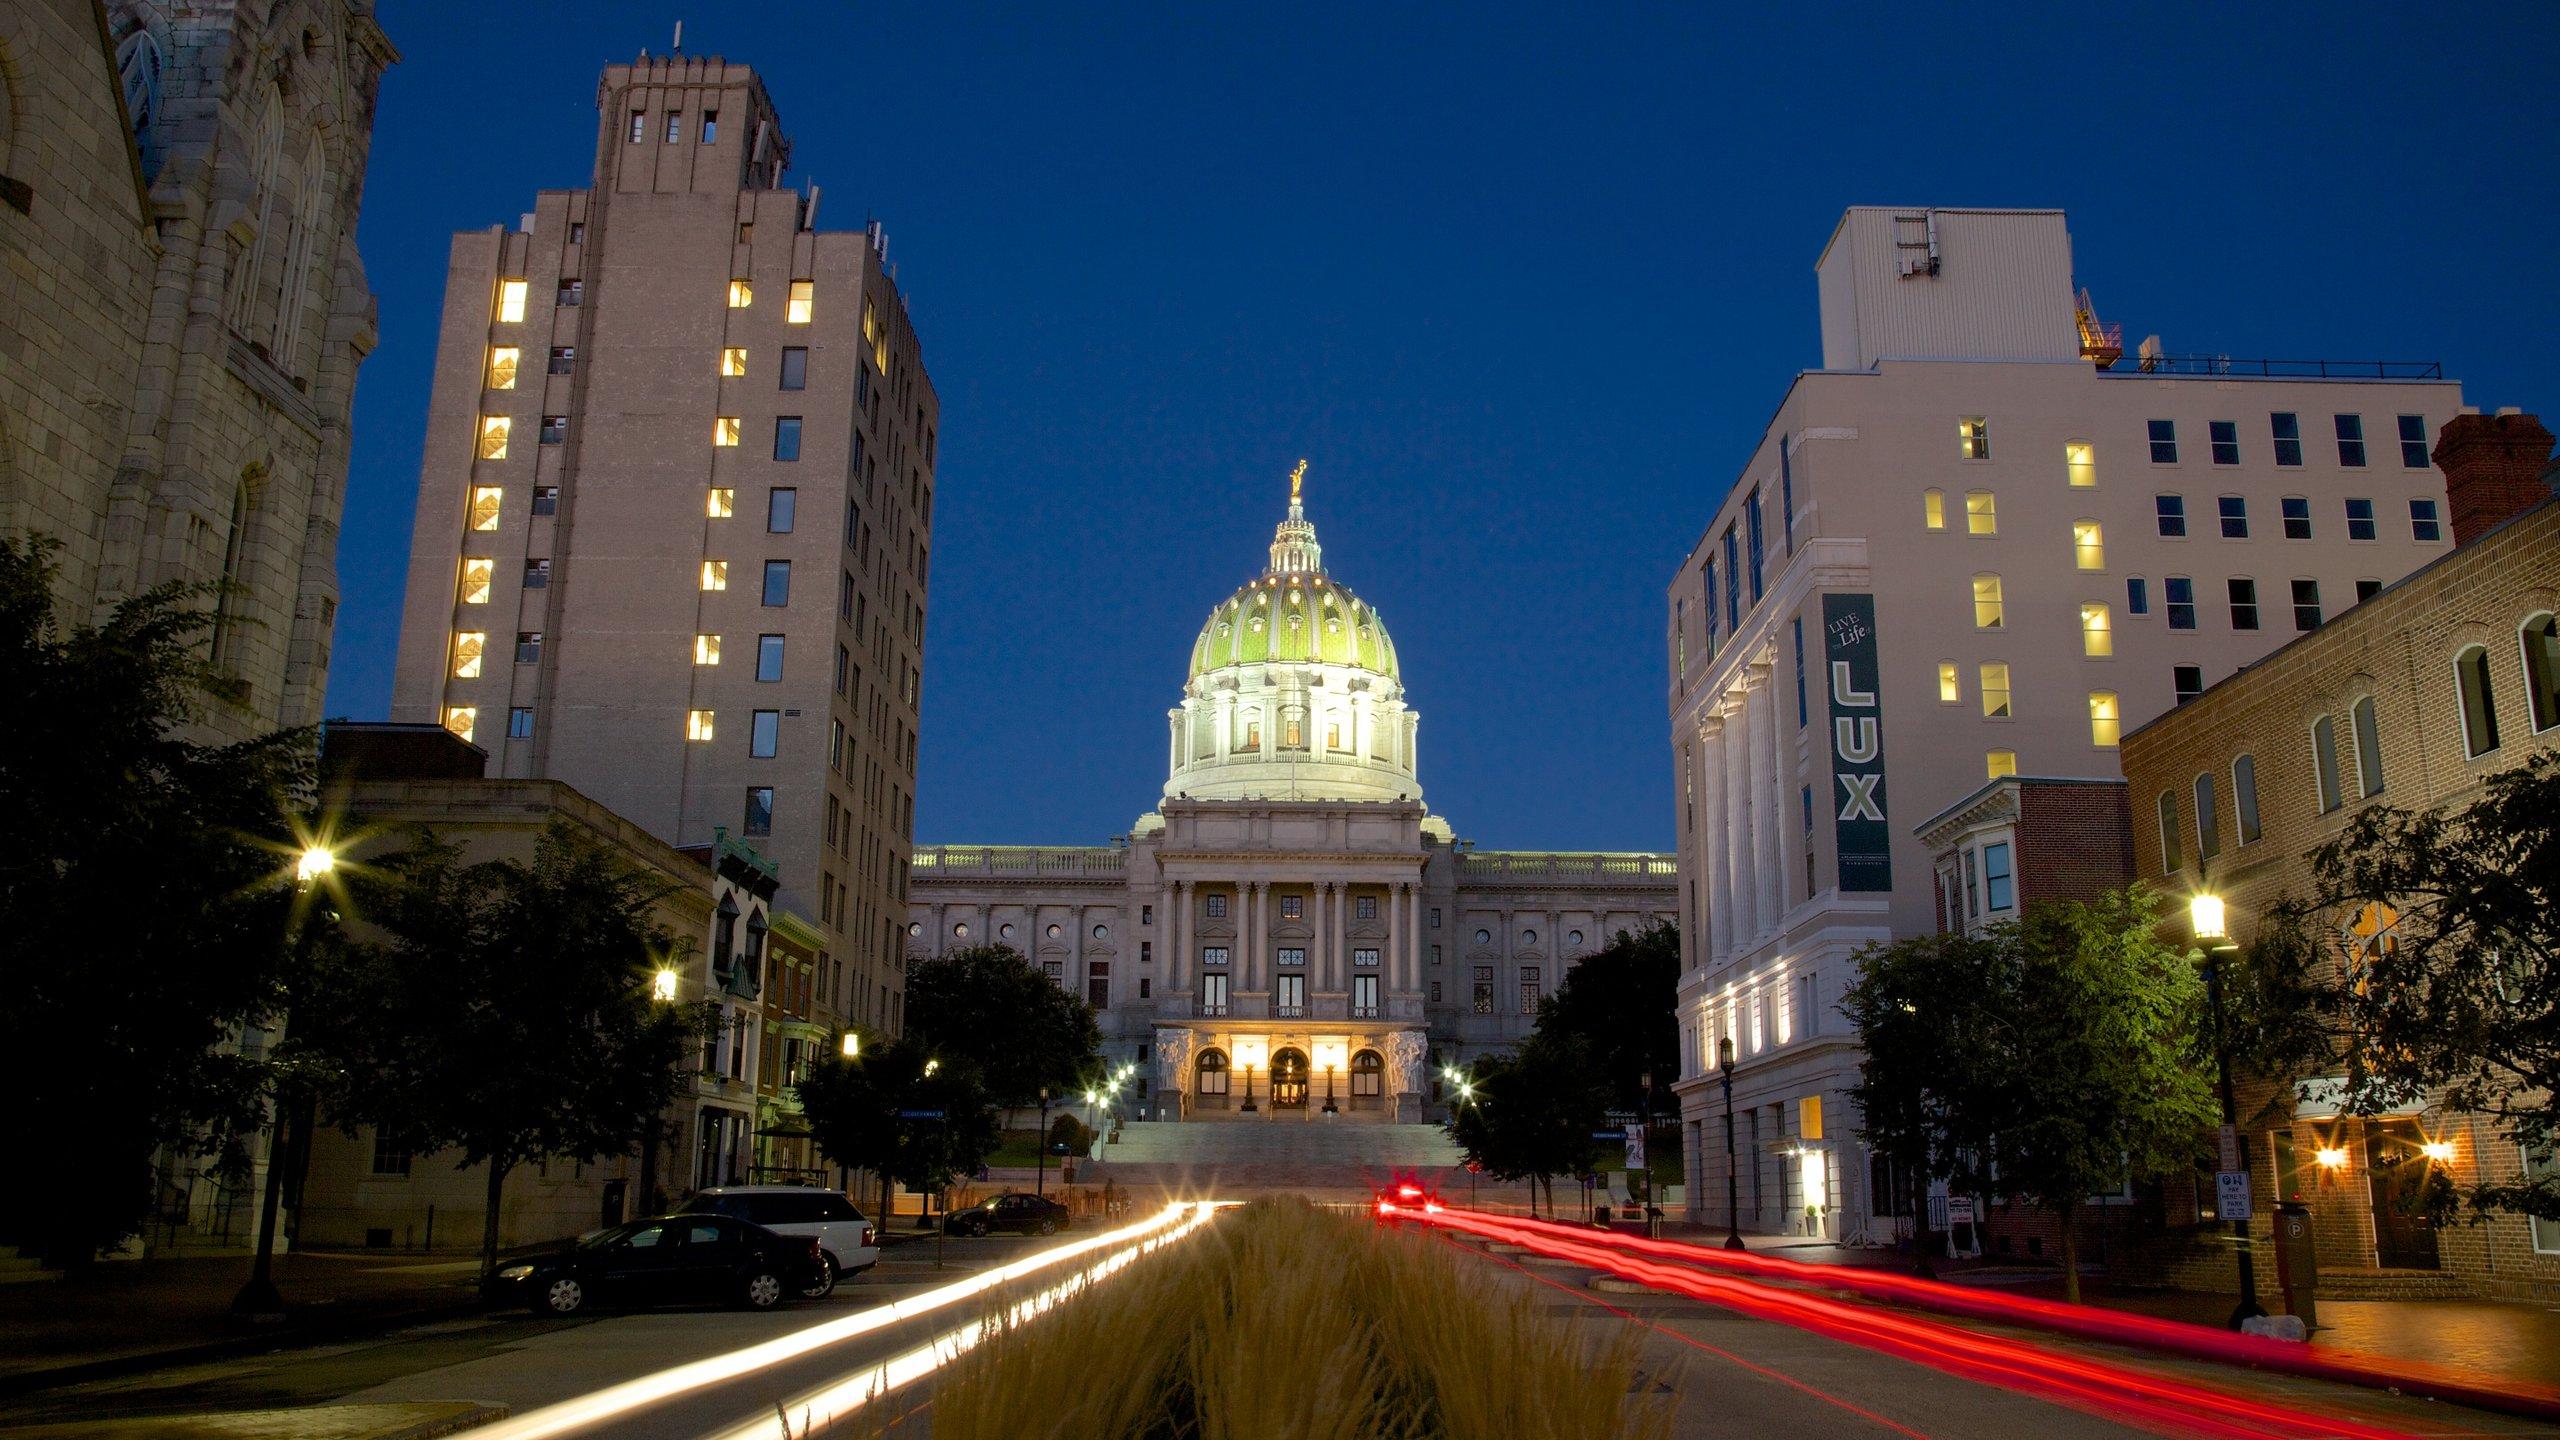 Pennsylvania State Capitol, Harrisburg, Pennsylvania, United States of America